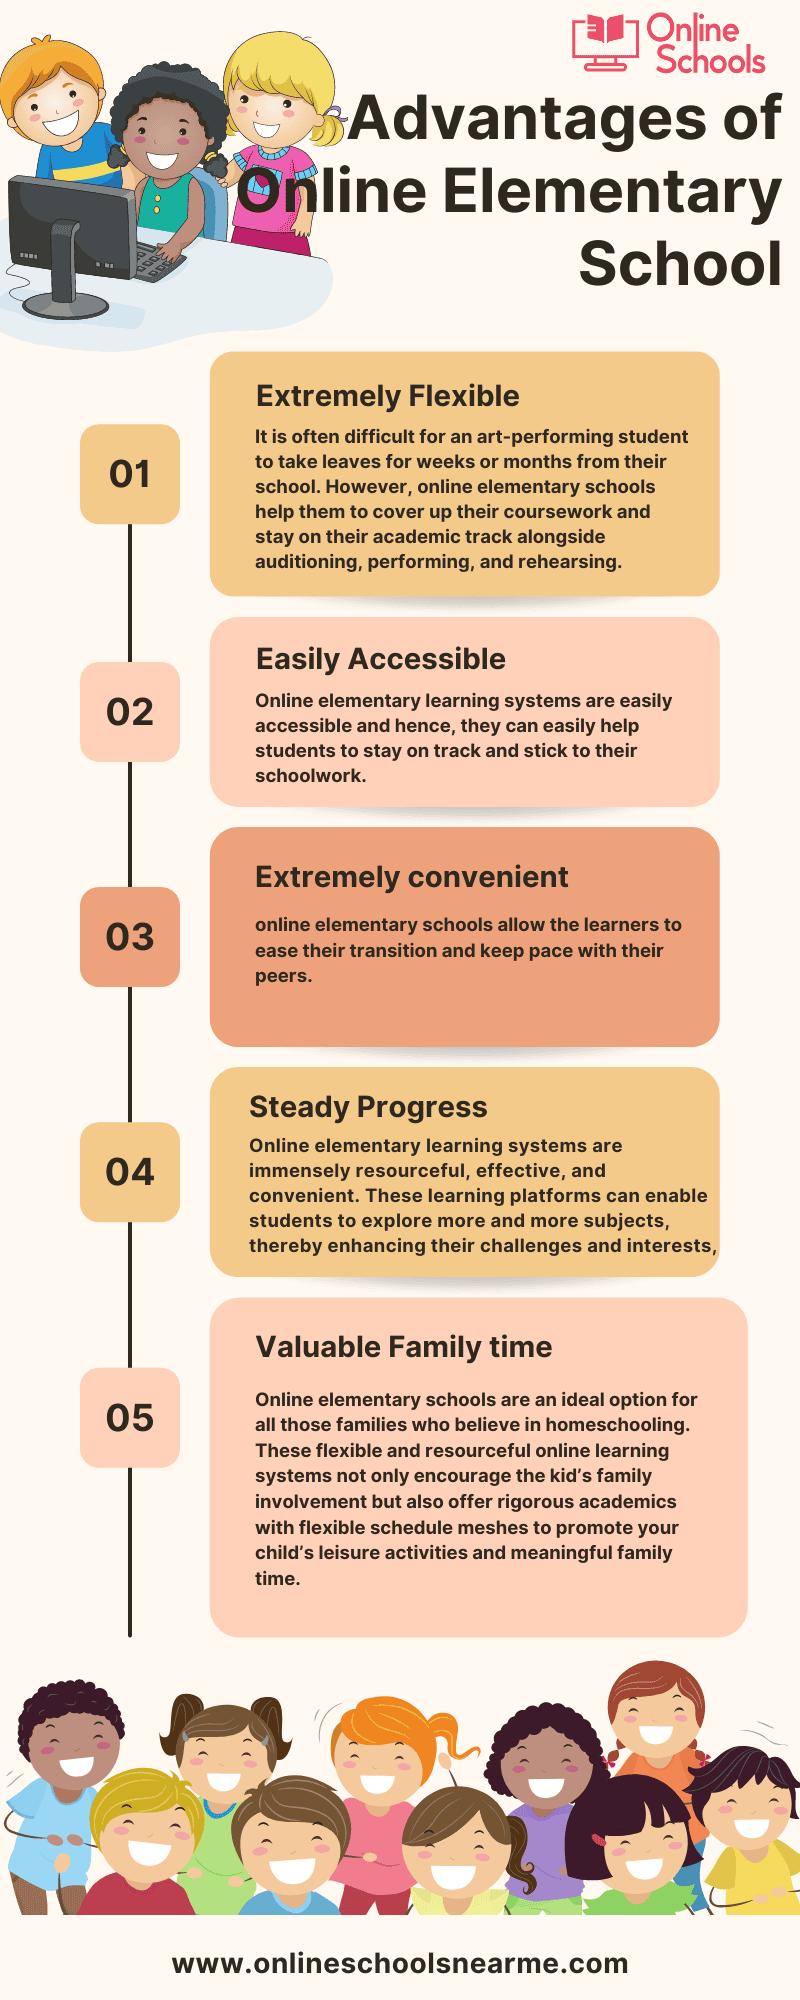 Advantages of Online Elementary school